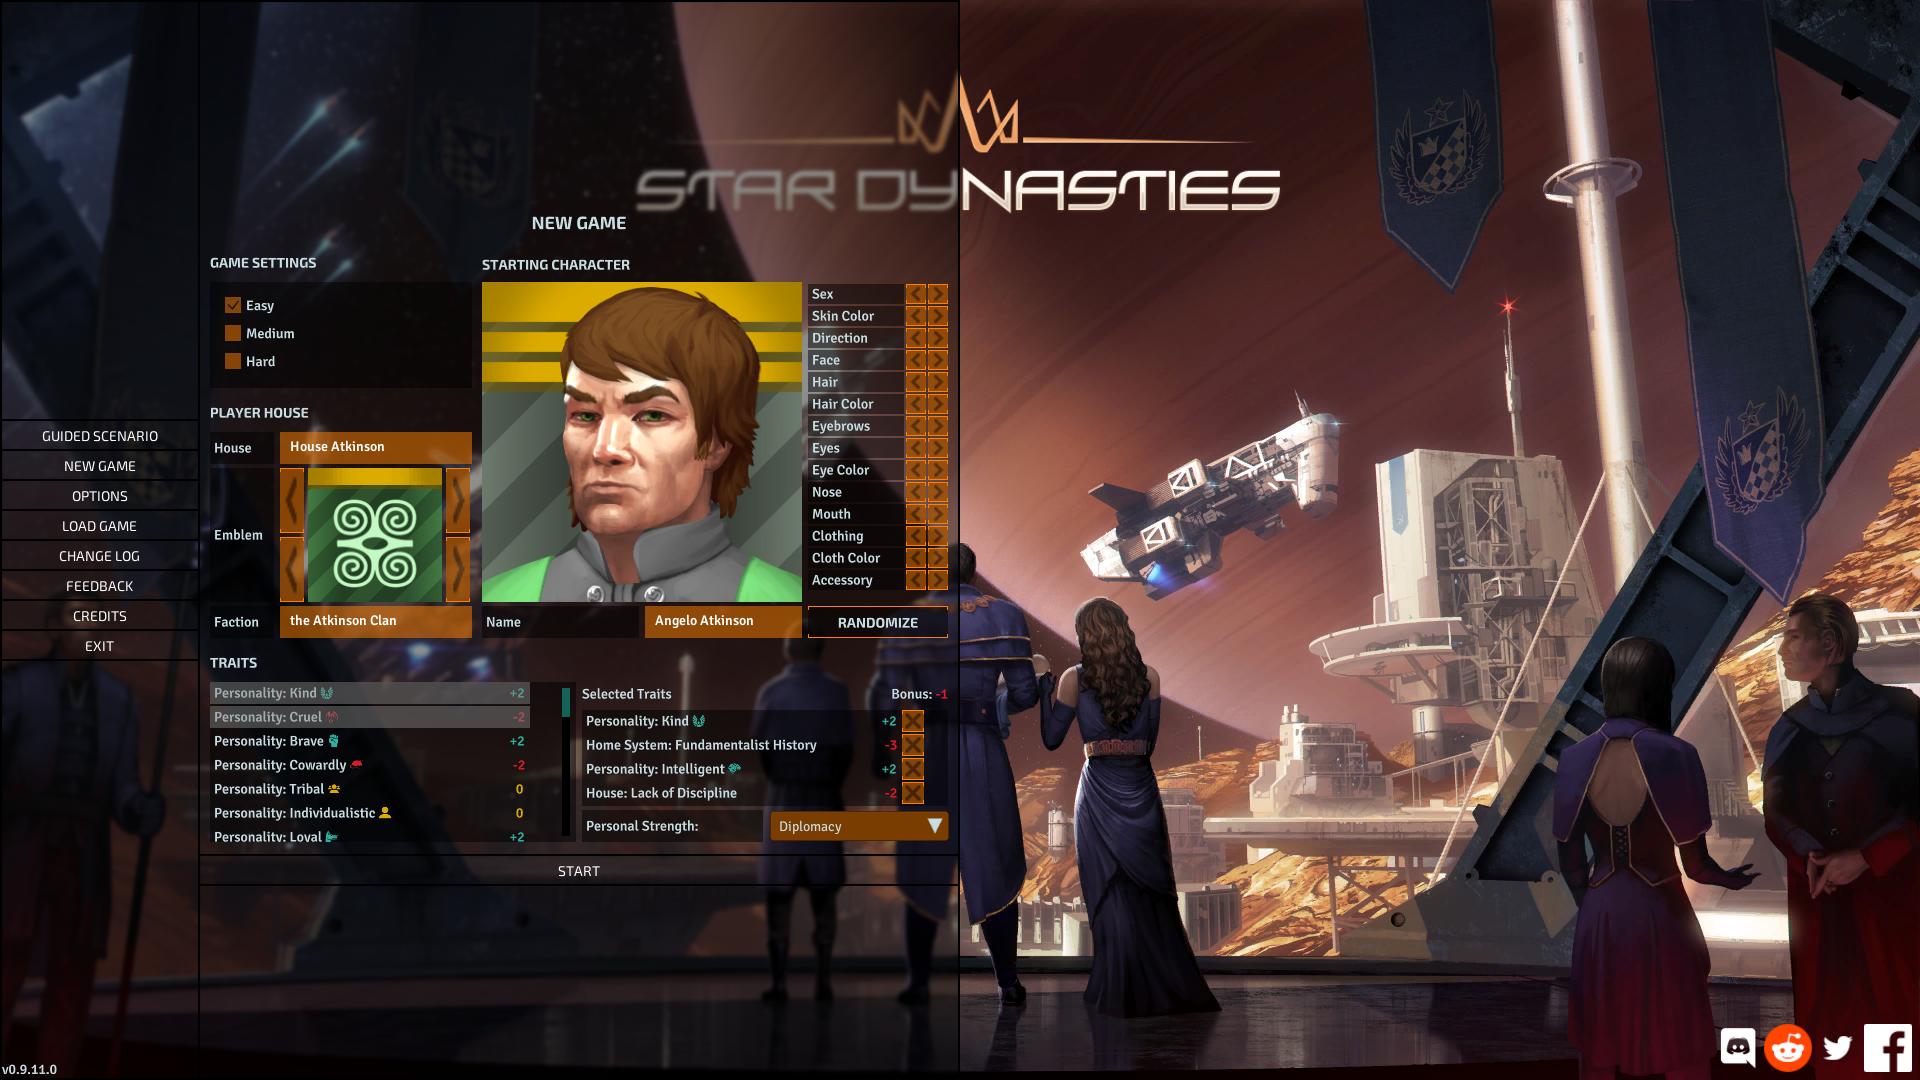 Star Dynasties character creation screen